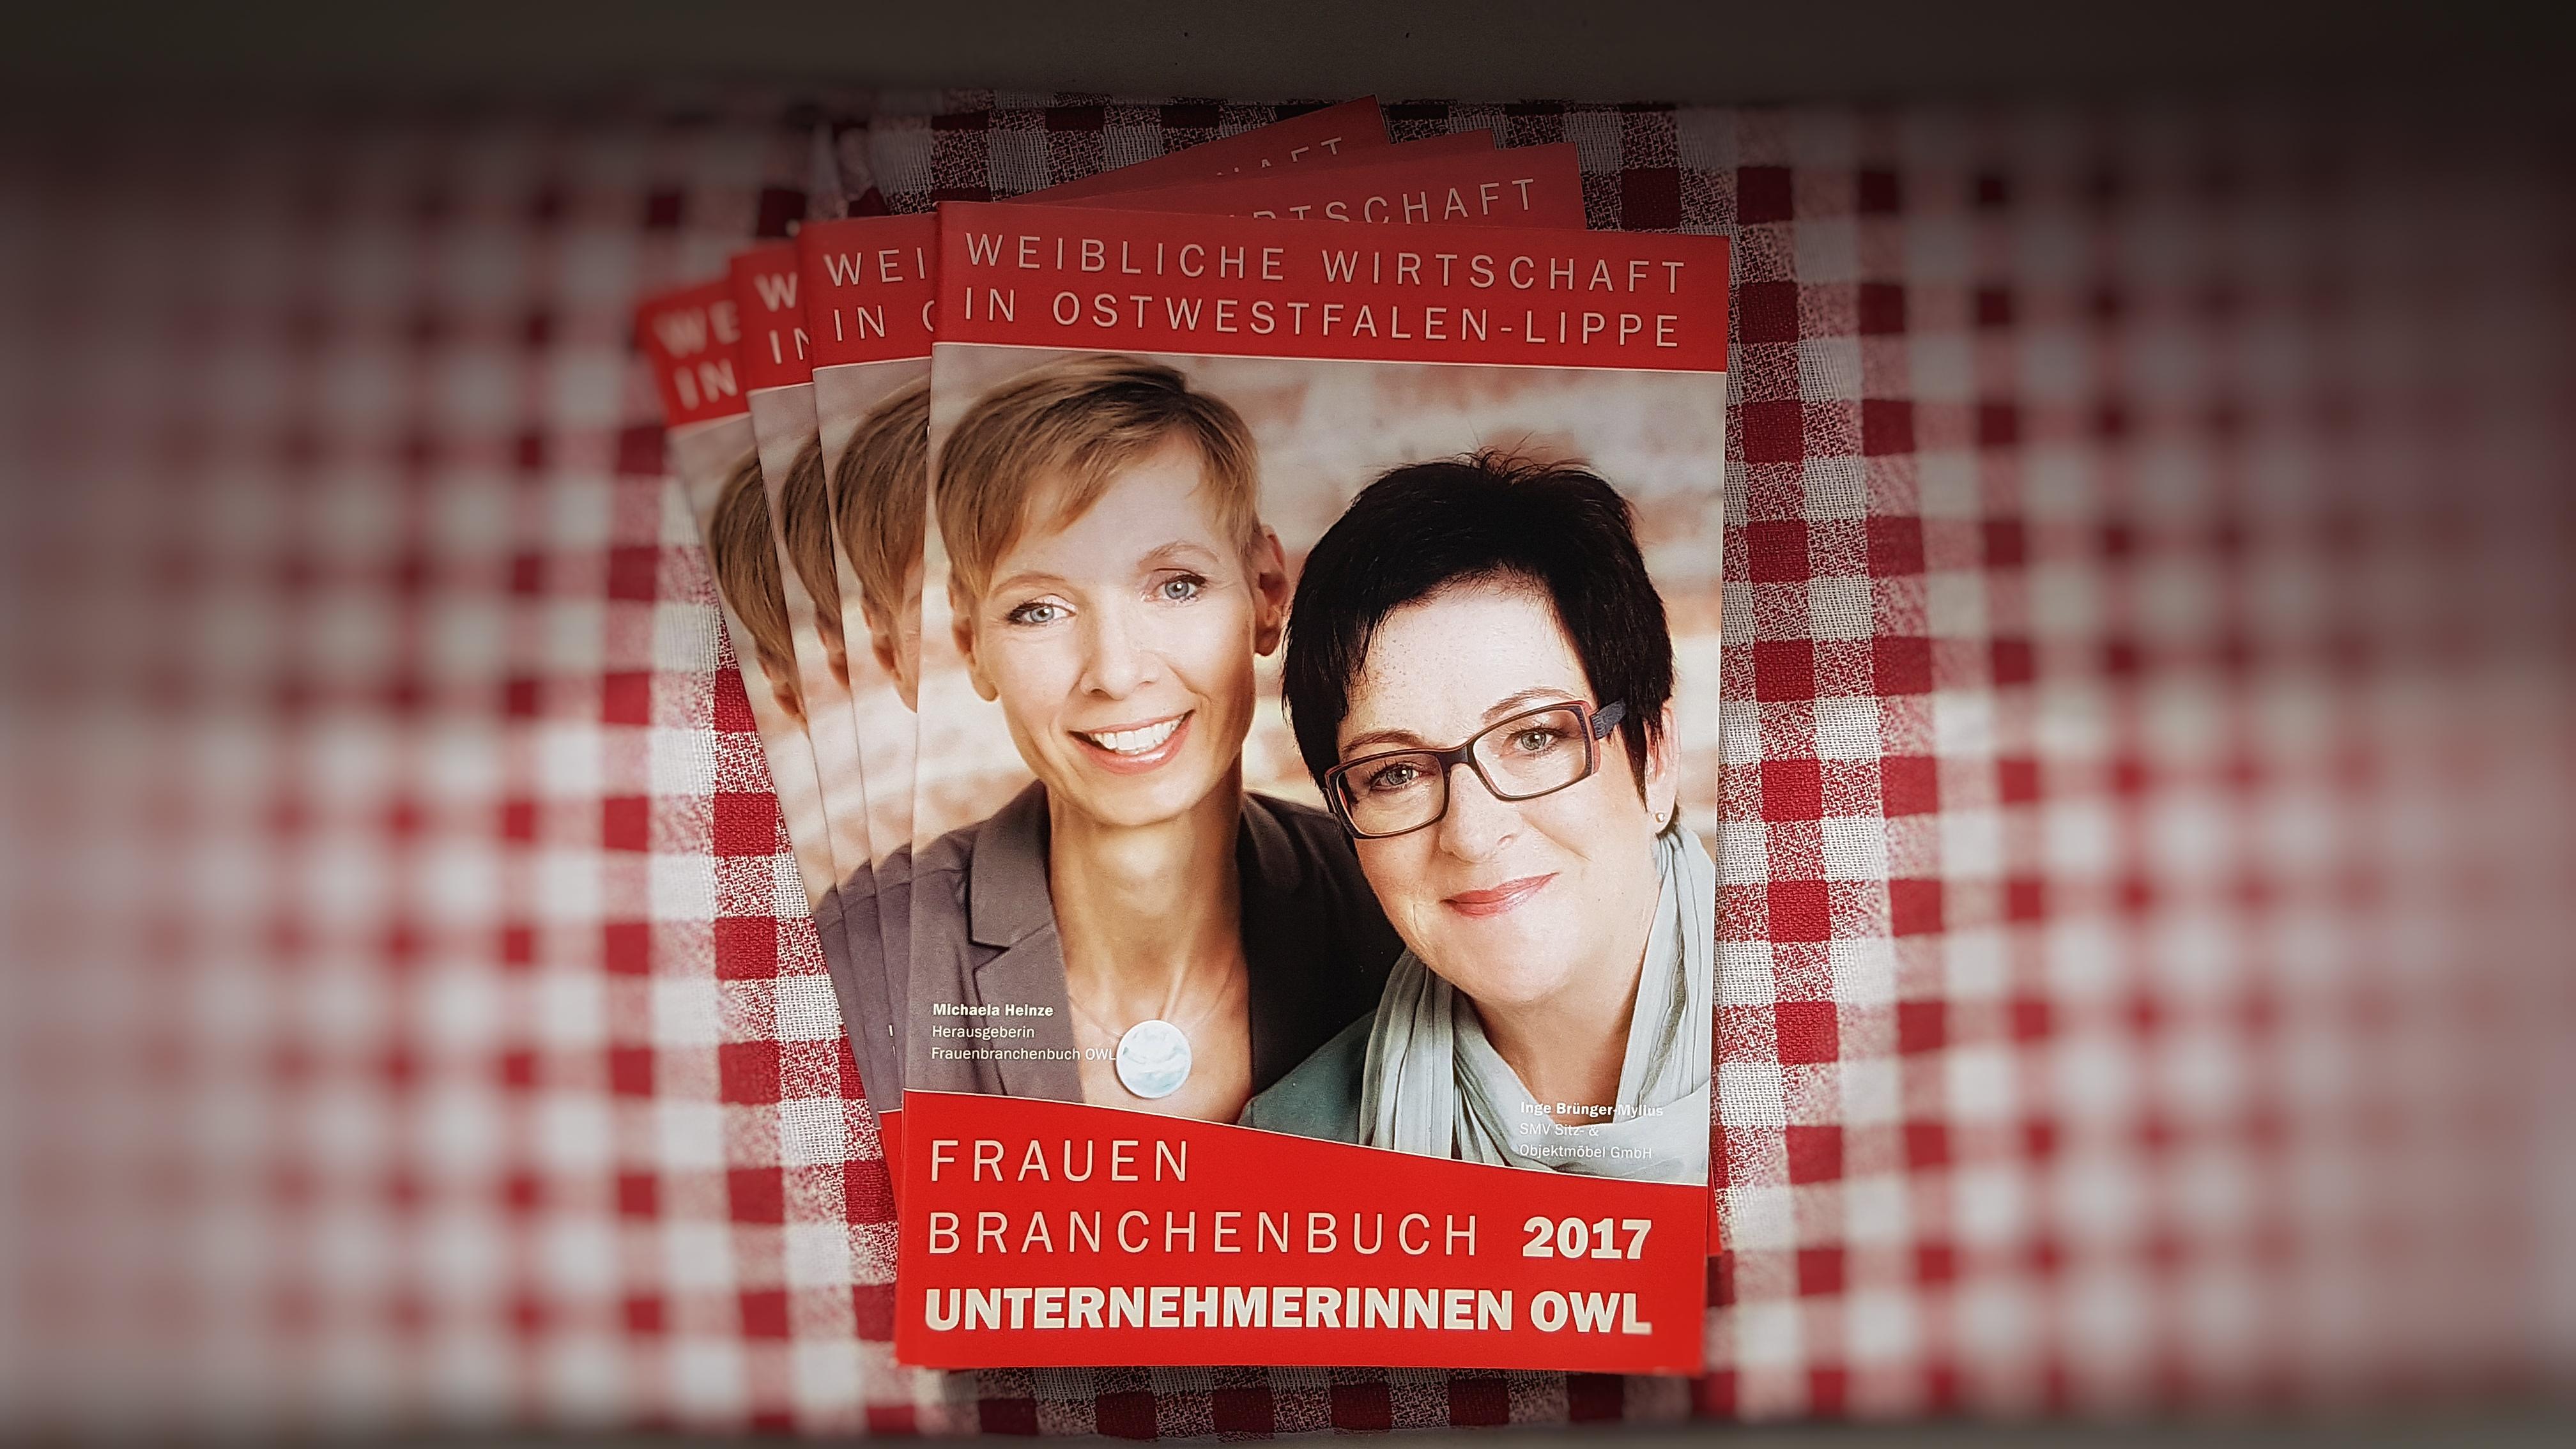 Frauenbranchenbuch OWL Mediadaten